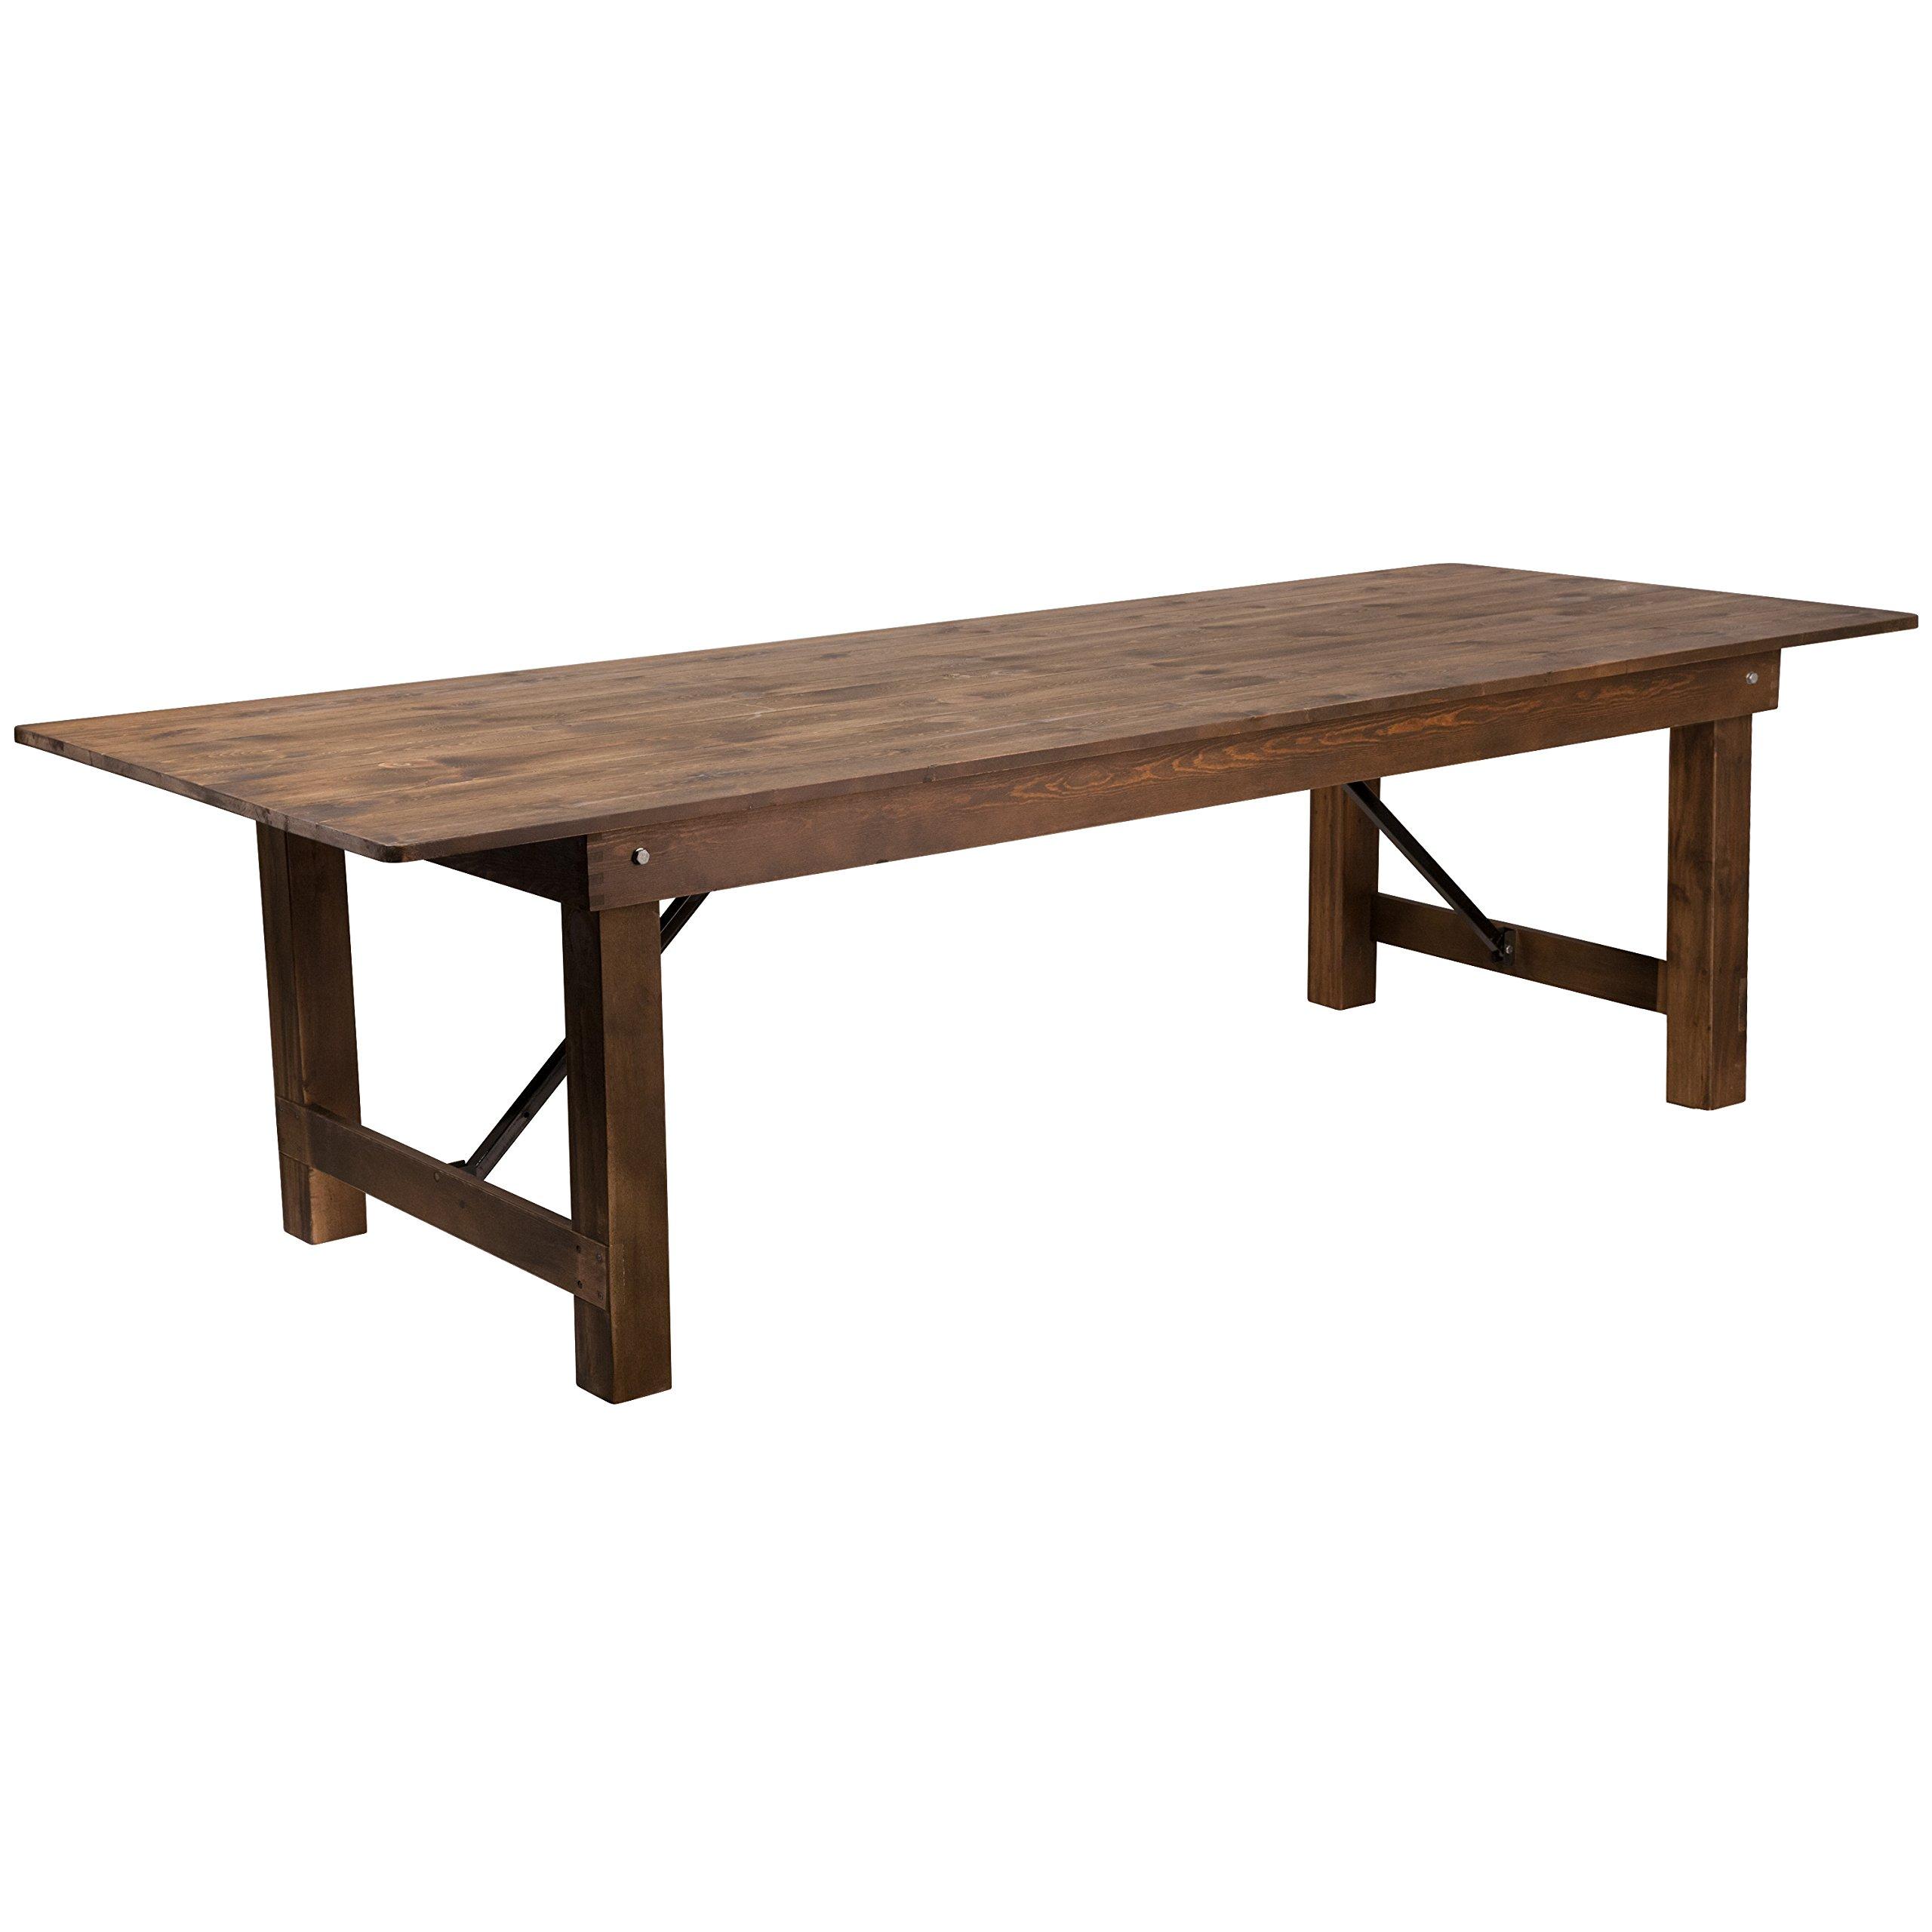 Flash Furniture HERCULES Series 9' x 40'' Antique Rustic Solid Pine Folding Farm Table